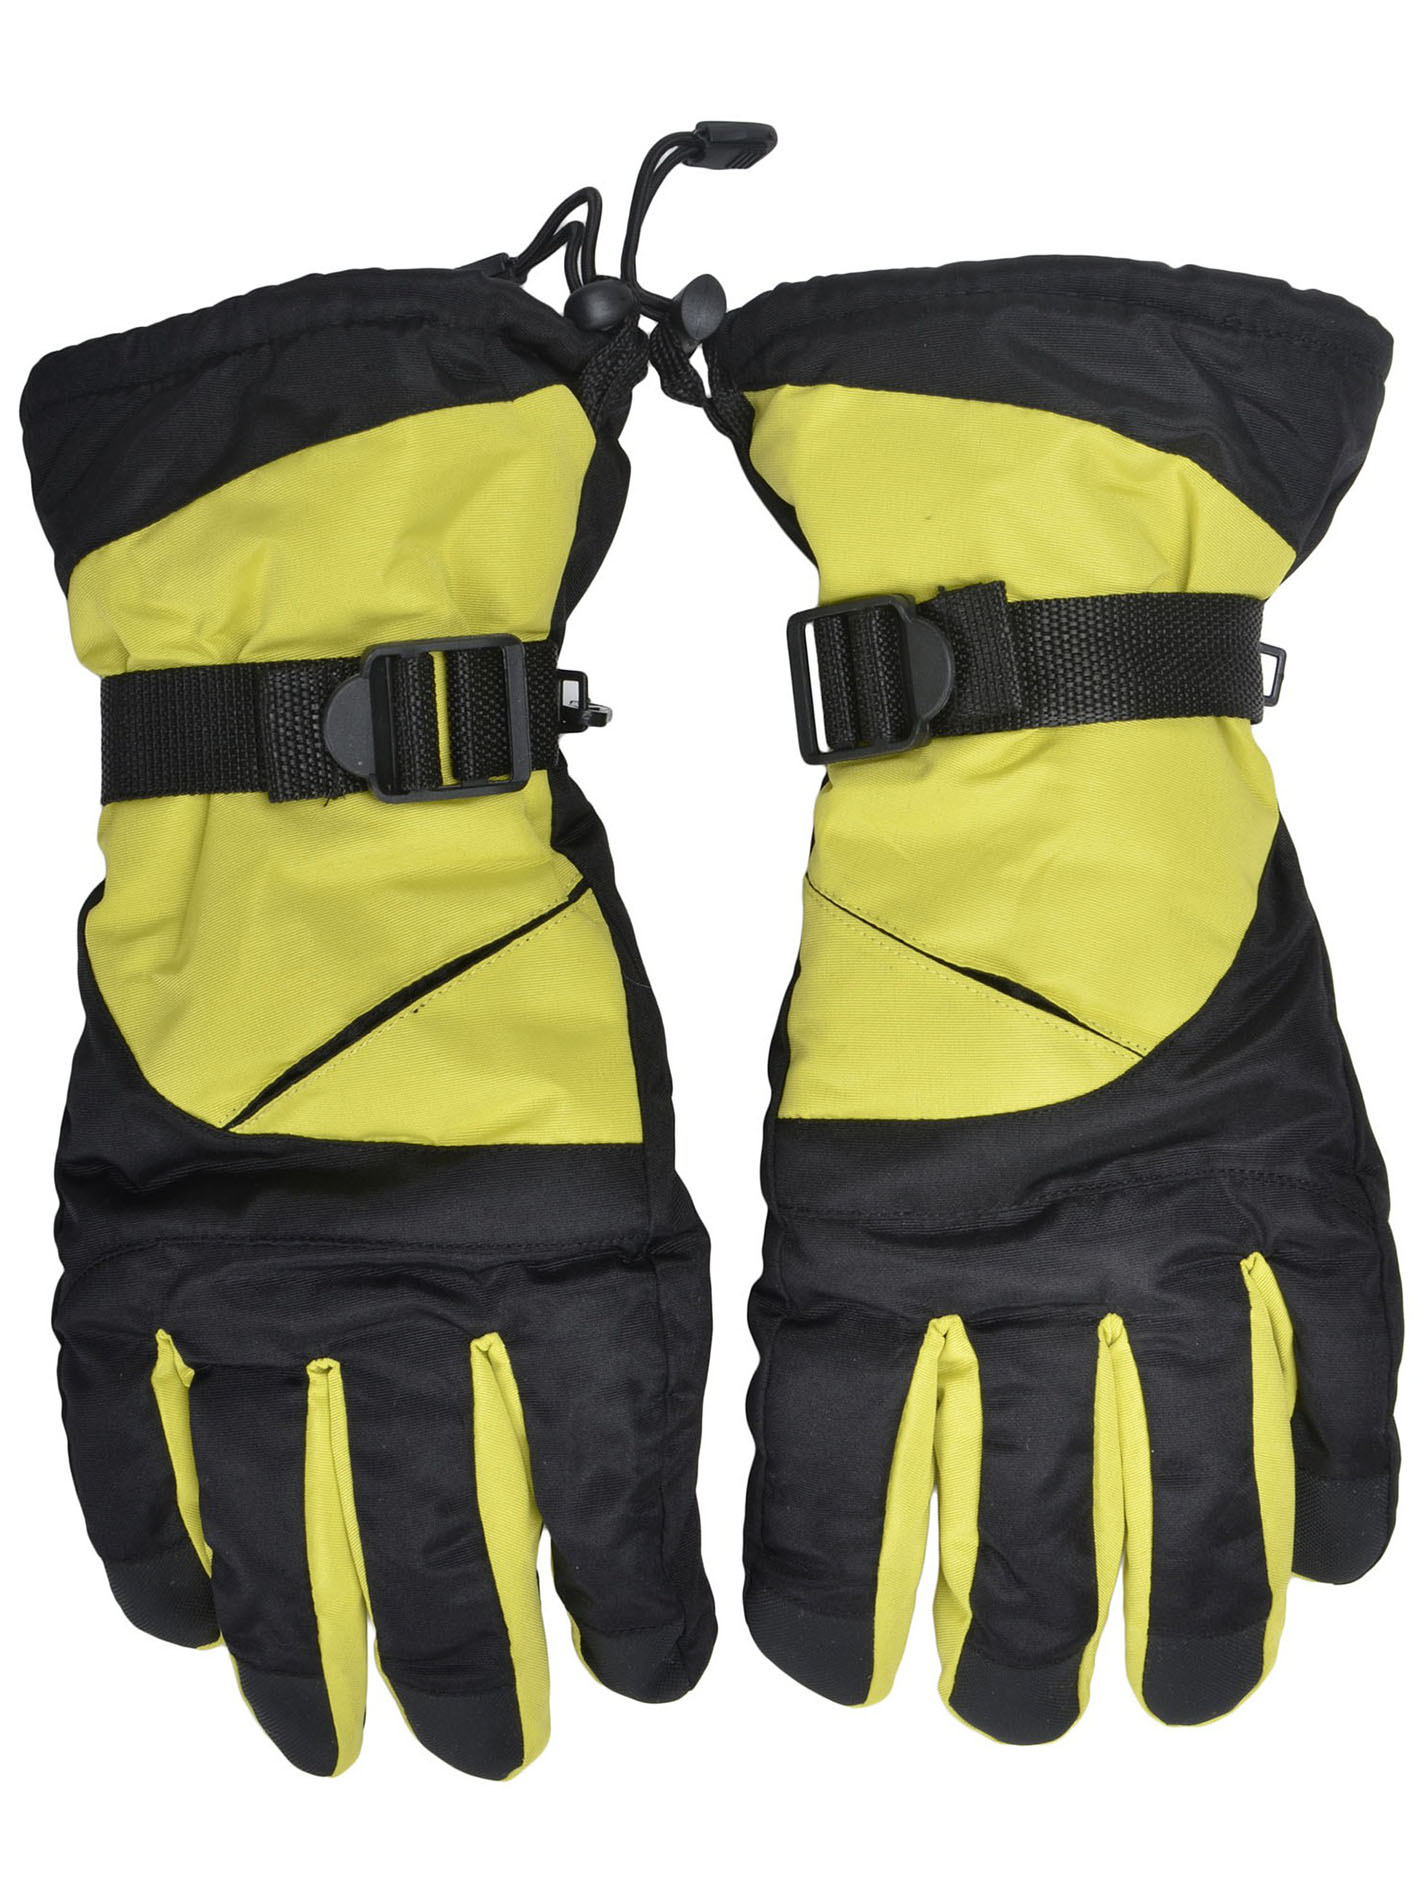 Men's Winter Adjustable Wrist Straps Waterproof Ski Gloves, Red Black2 by